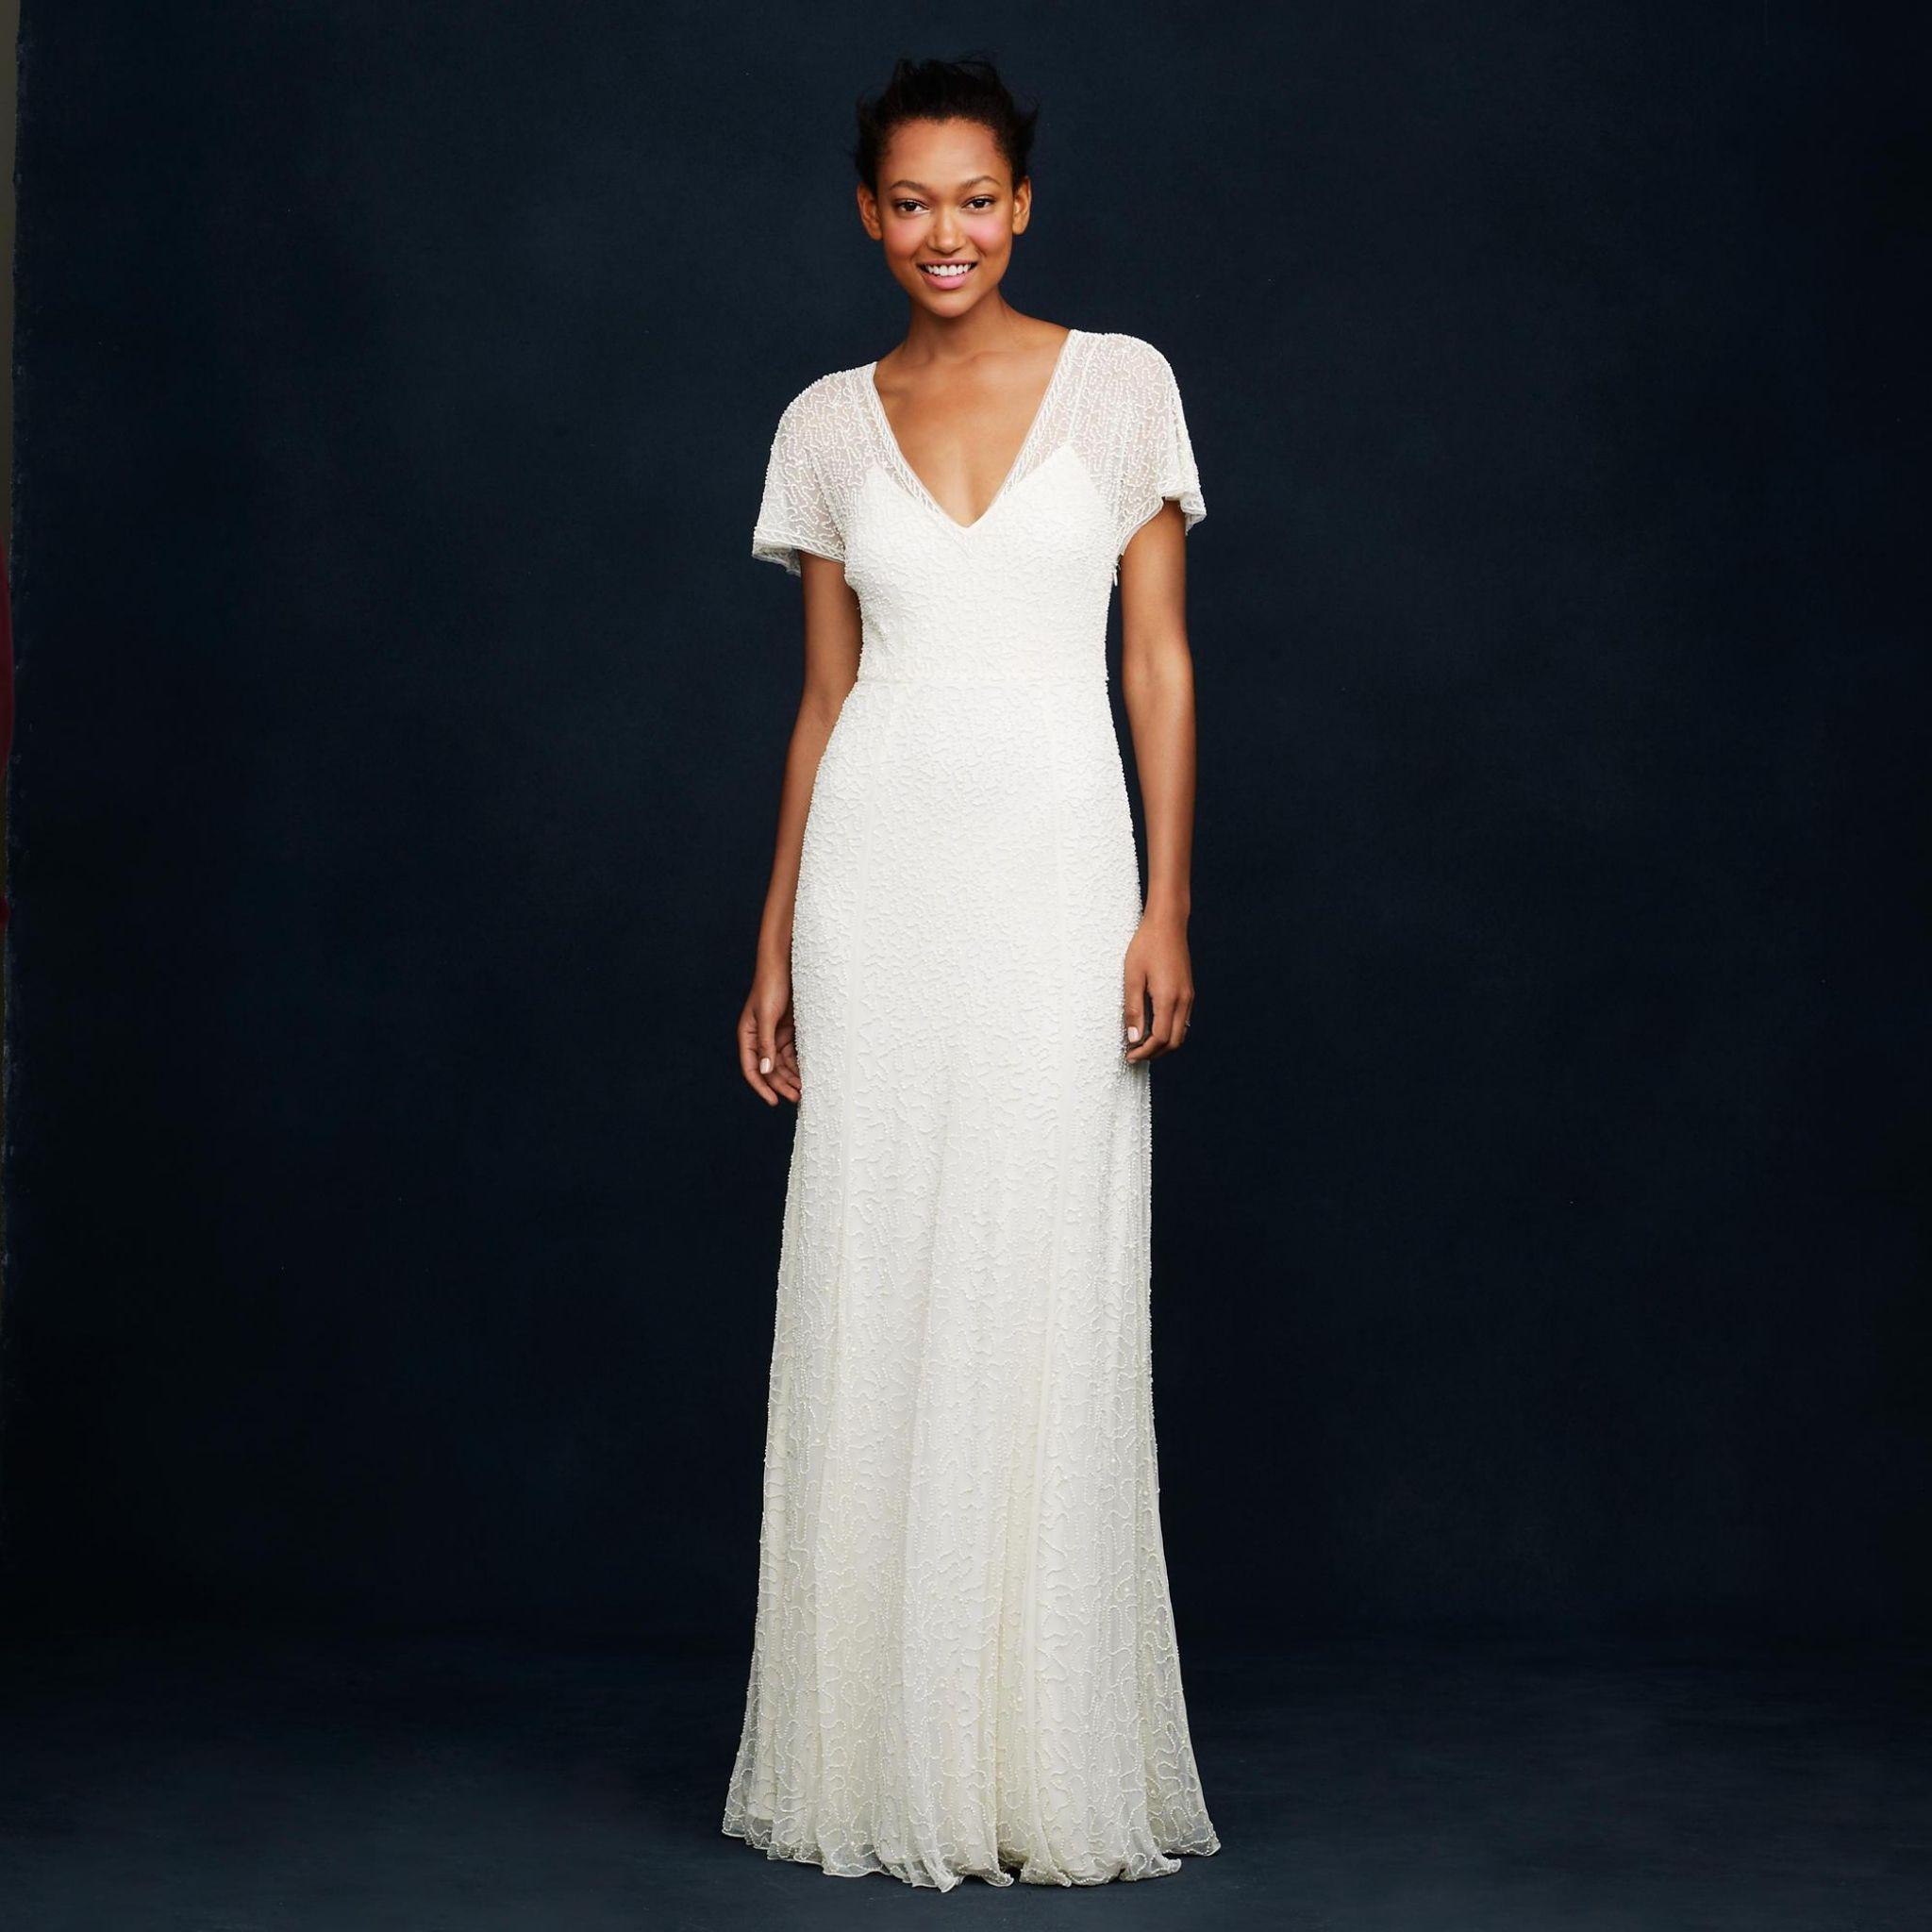 j crew arabelle wedding dress - dresses for guest at wedding Check ...